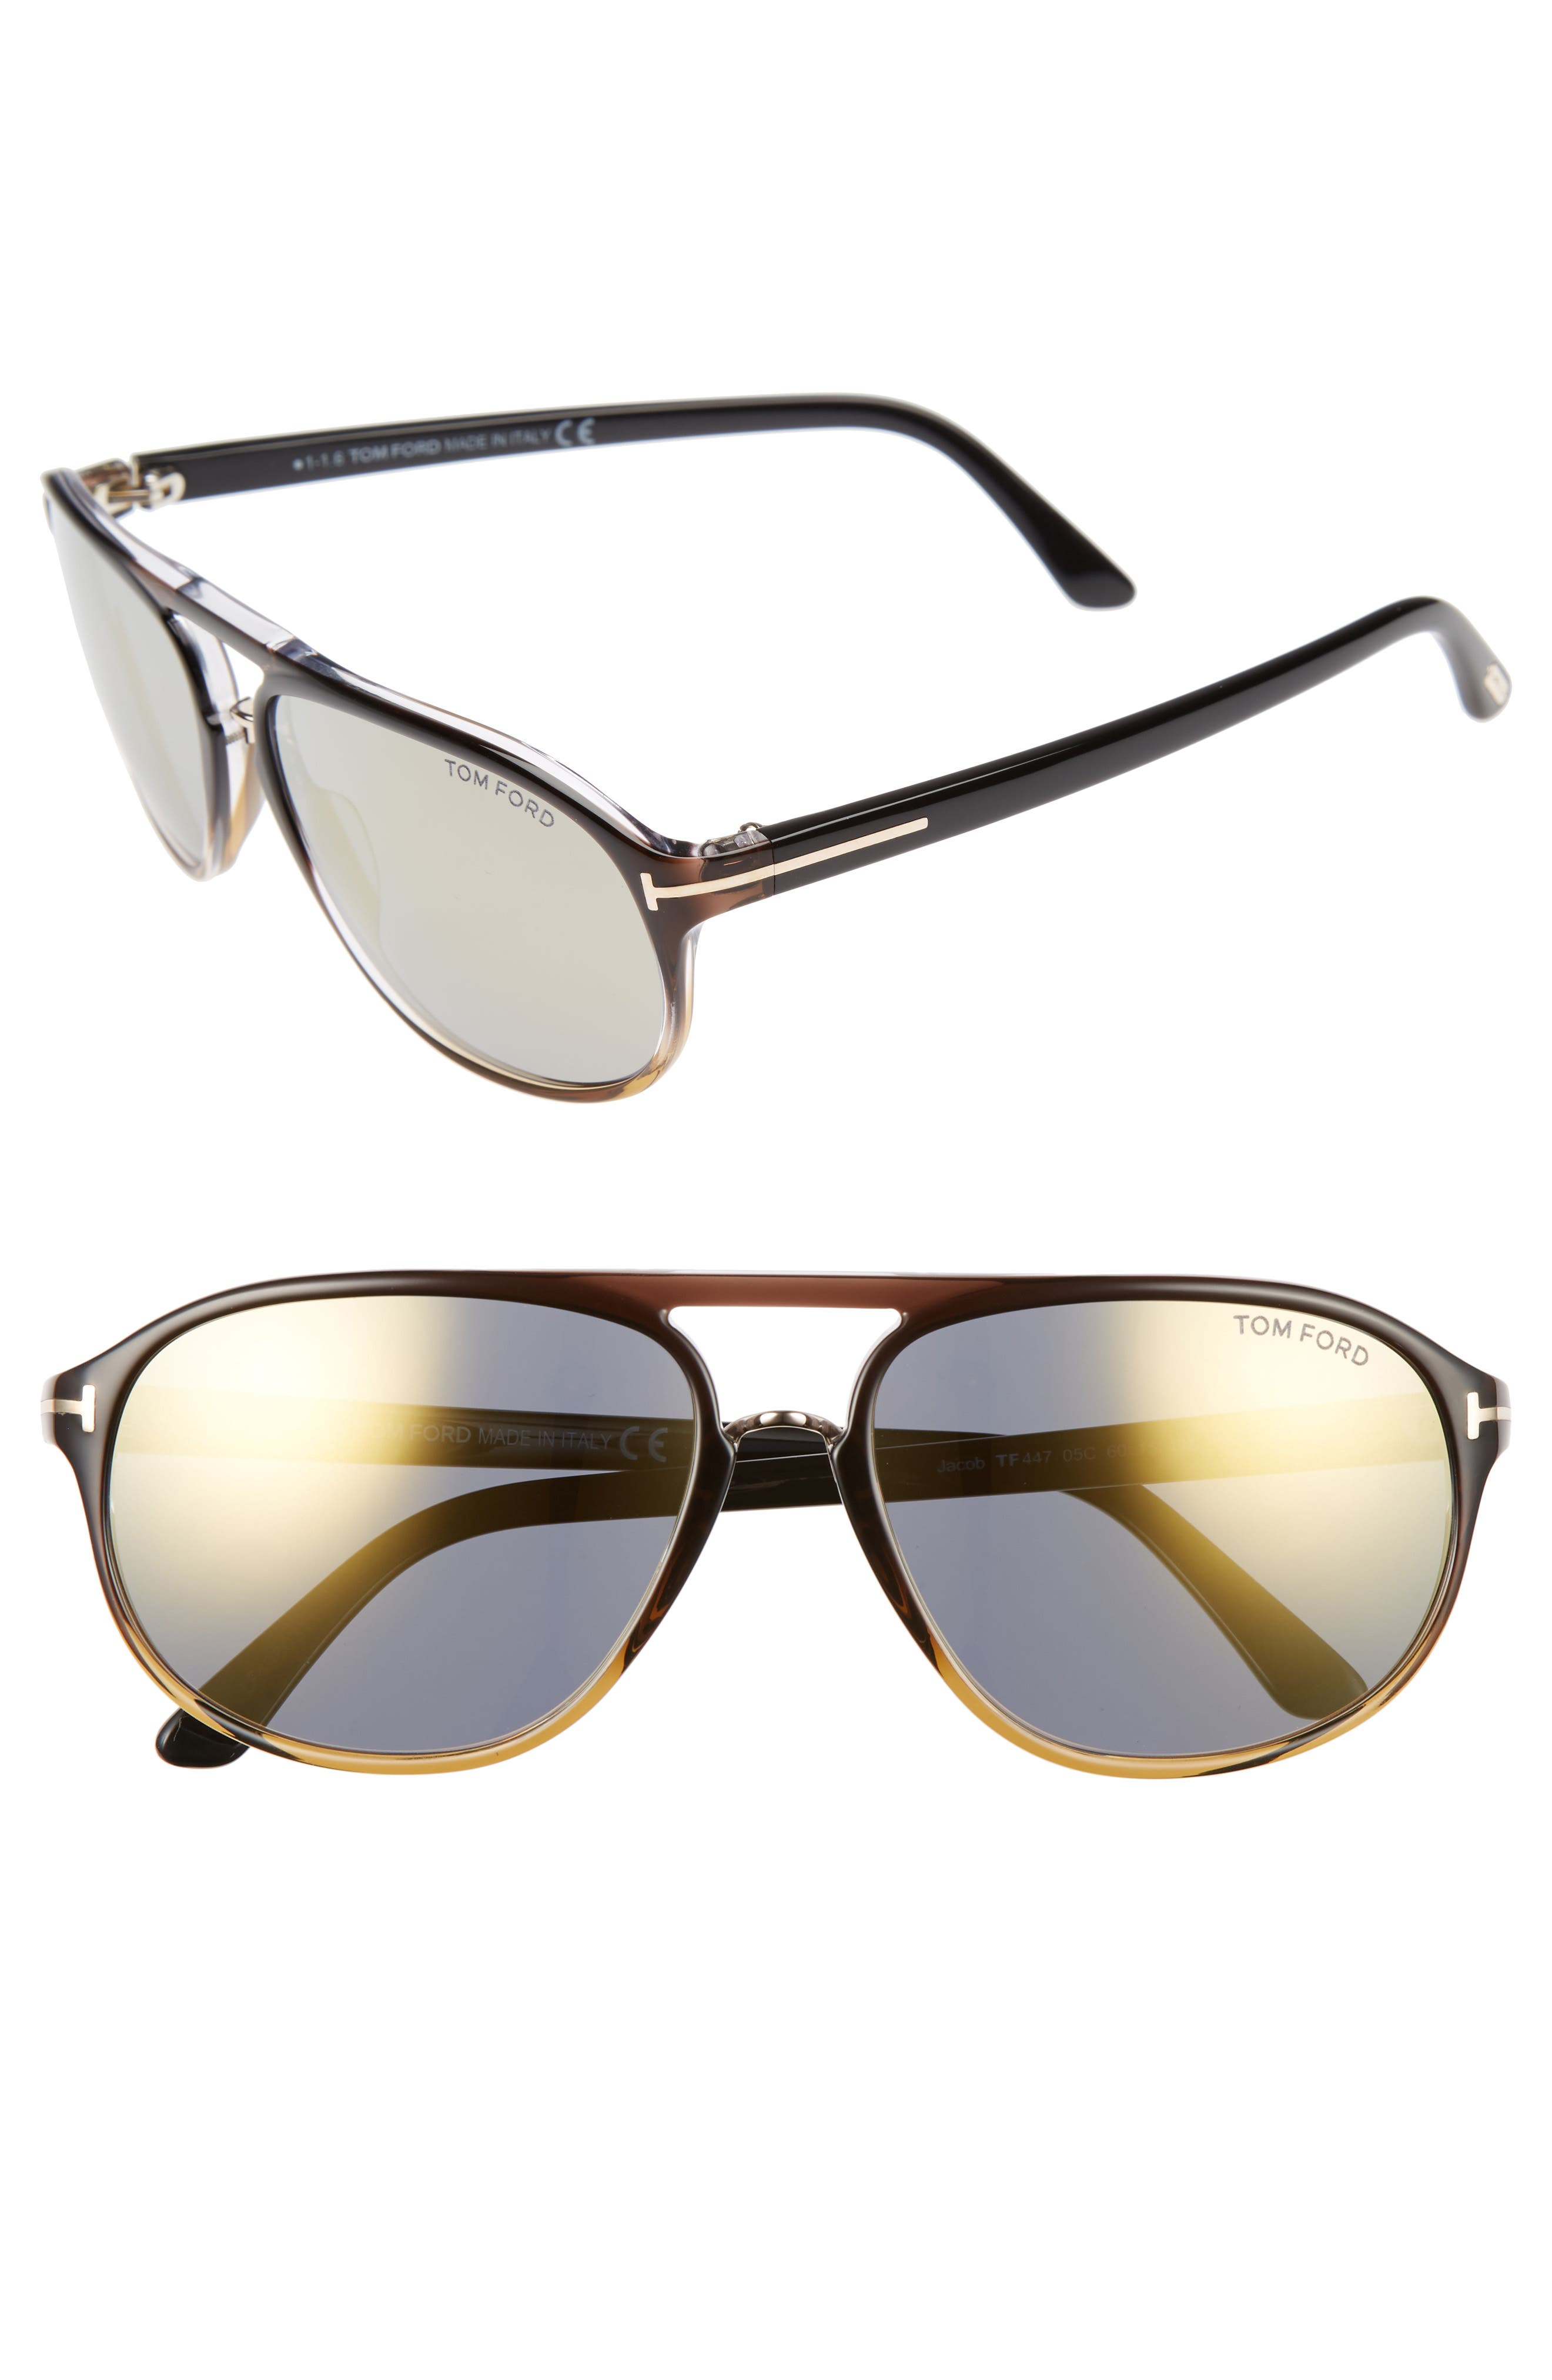 Main Image - Tom Ford Jacob 60mm Retro Sunglasses